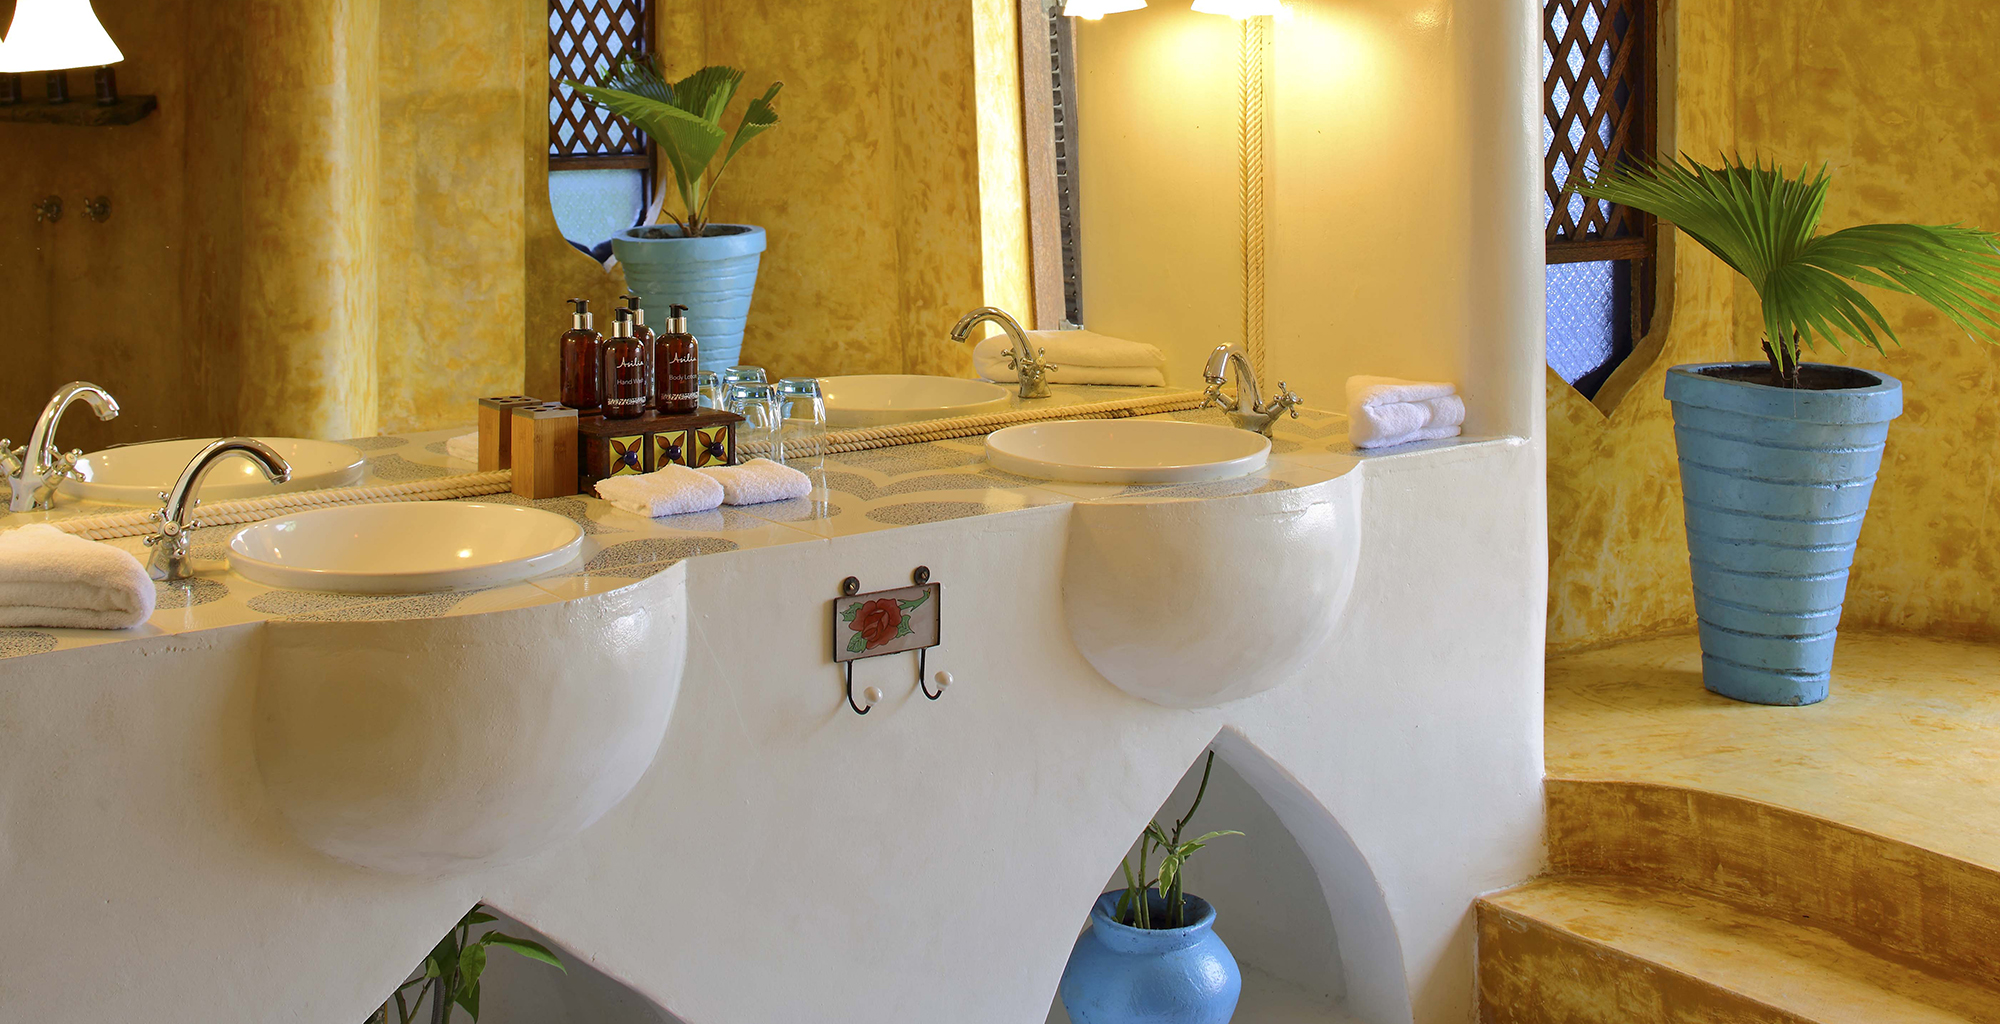 Tanzania-Matemwe-Retreat-Bathroom-Sink